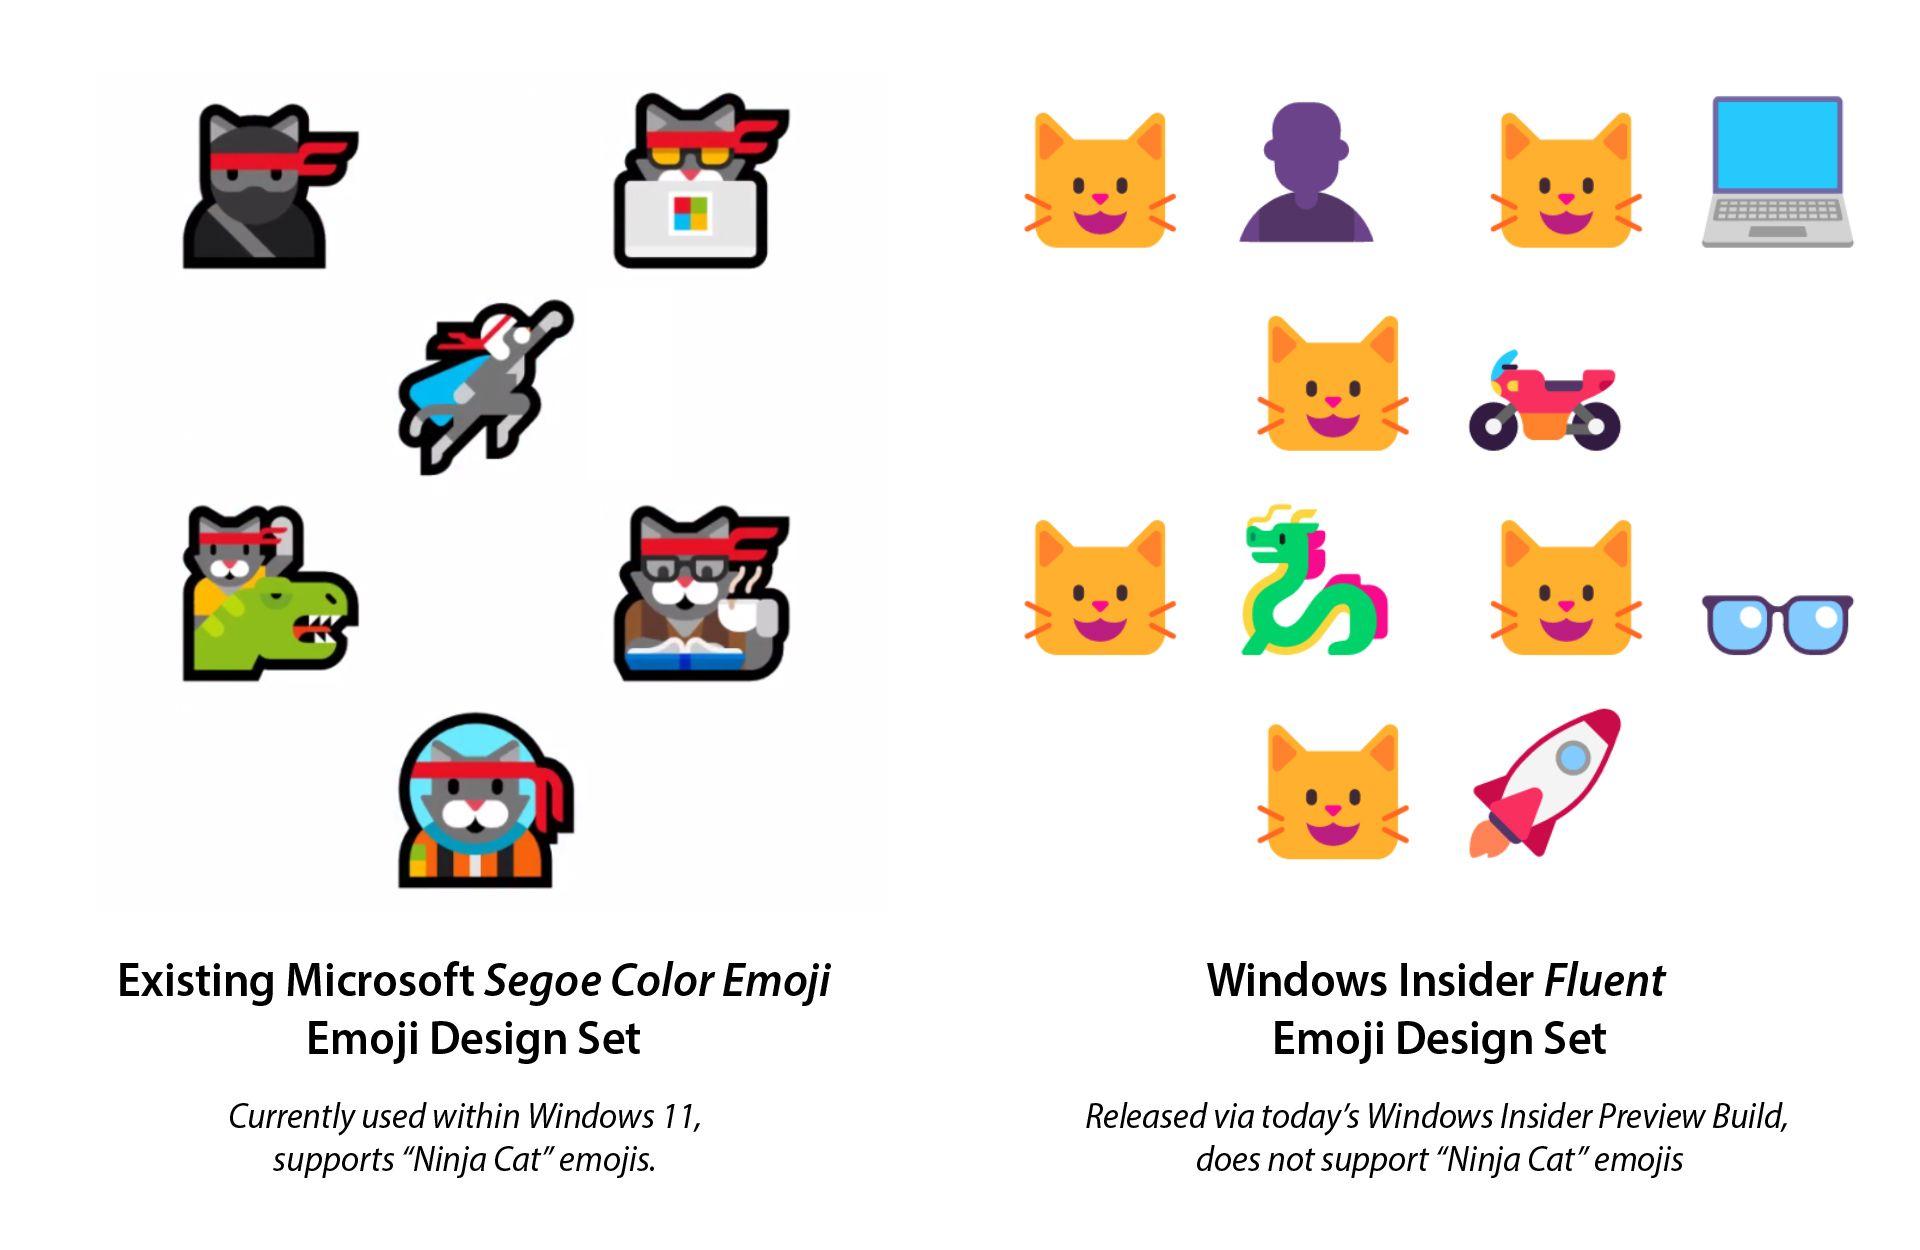 Emojipedia-Windows-11-Launch-Segoe-Fluent-Launch-NINJA-CAT